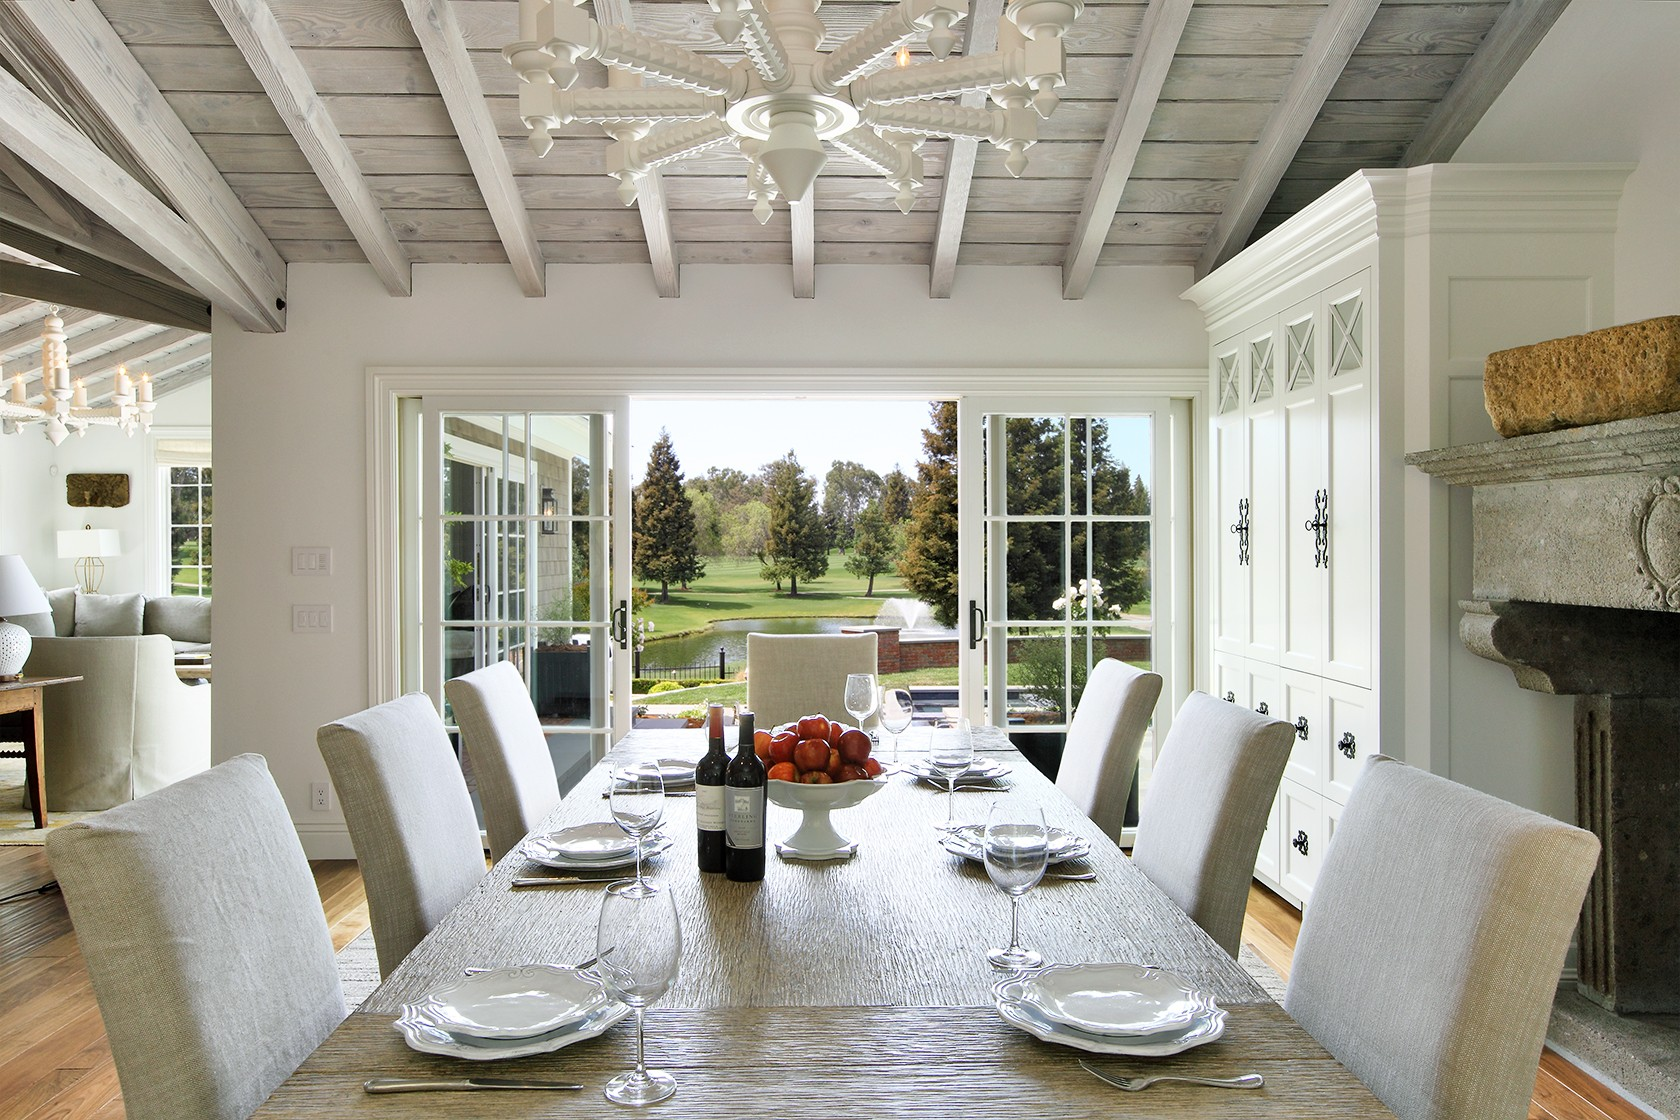 golf_house_dining _room_modern_beams_beachouse.jpg